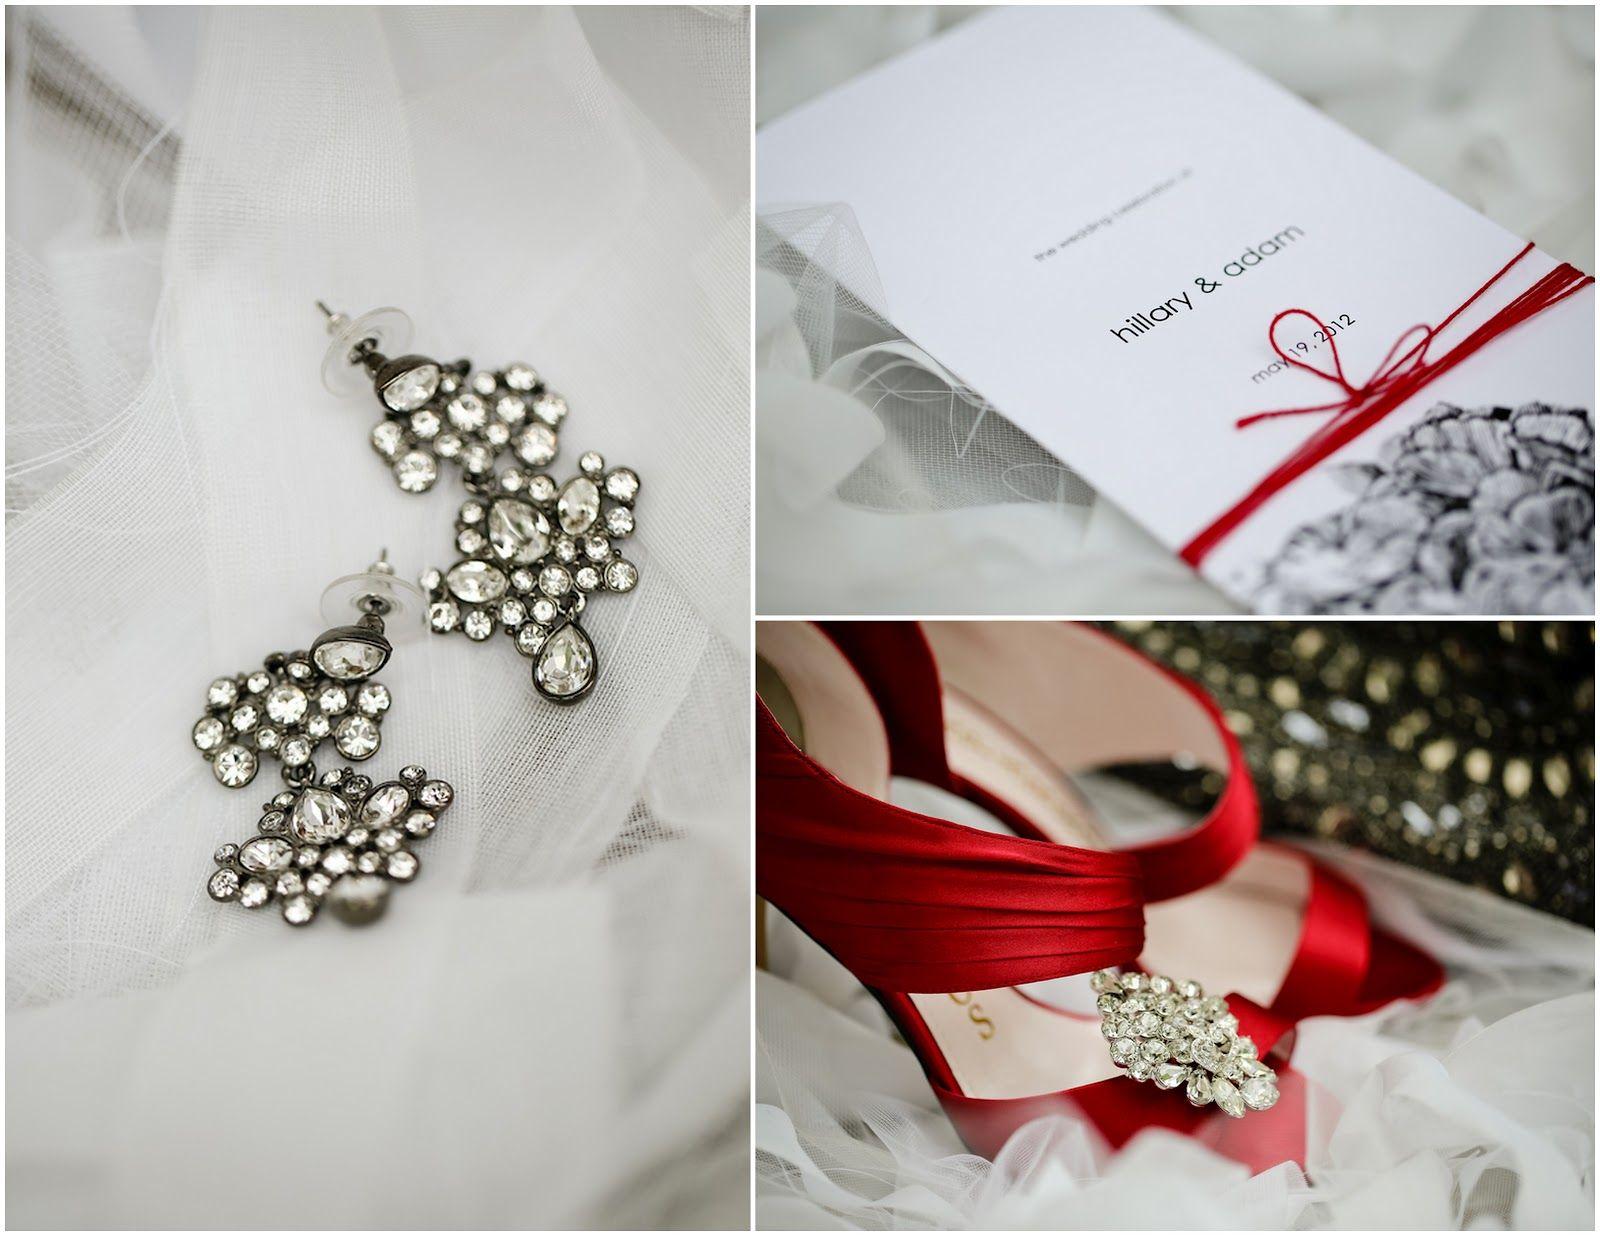 Black white tie red maroon wedding theme inspiration sparkle classic ...